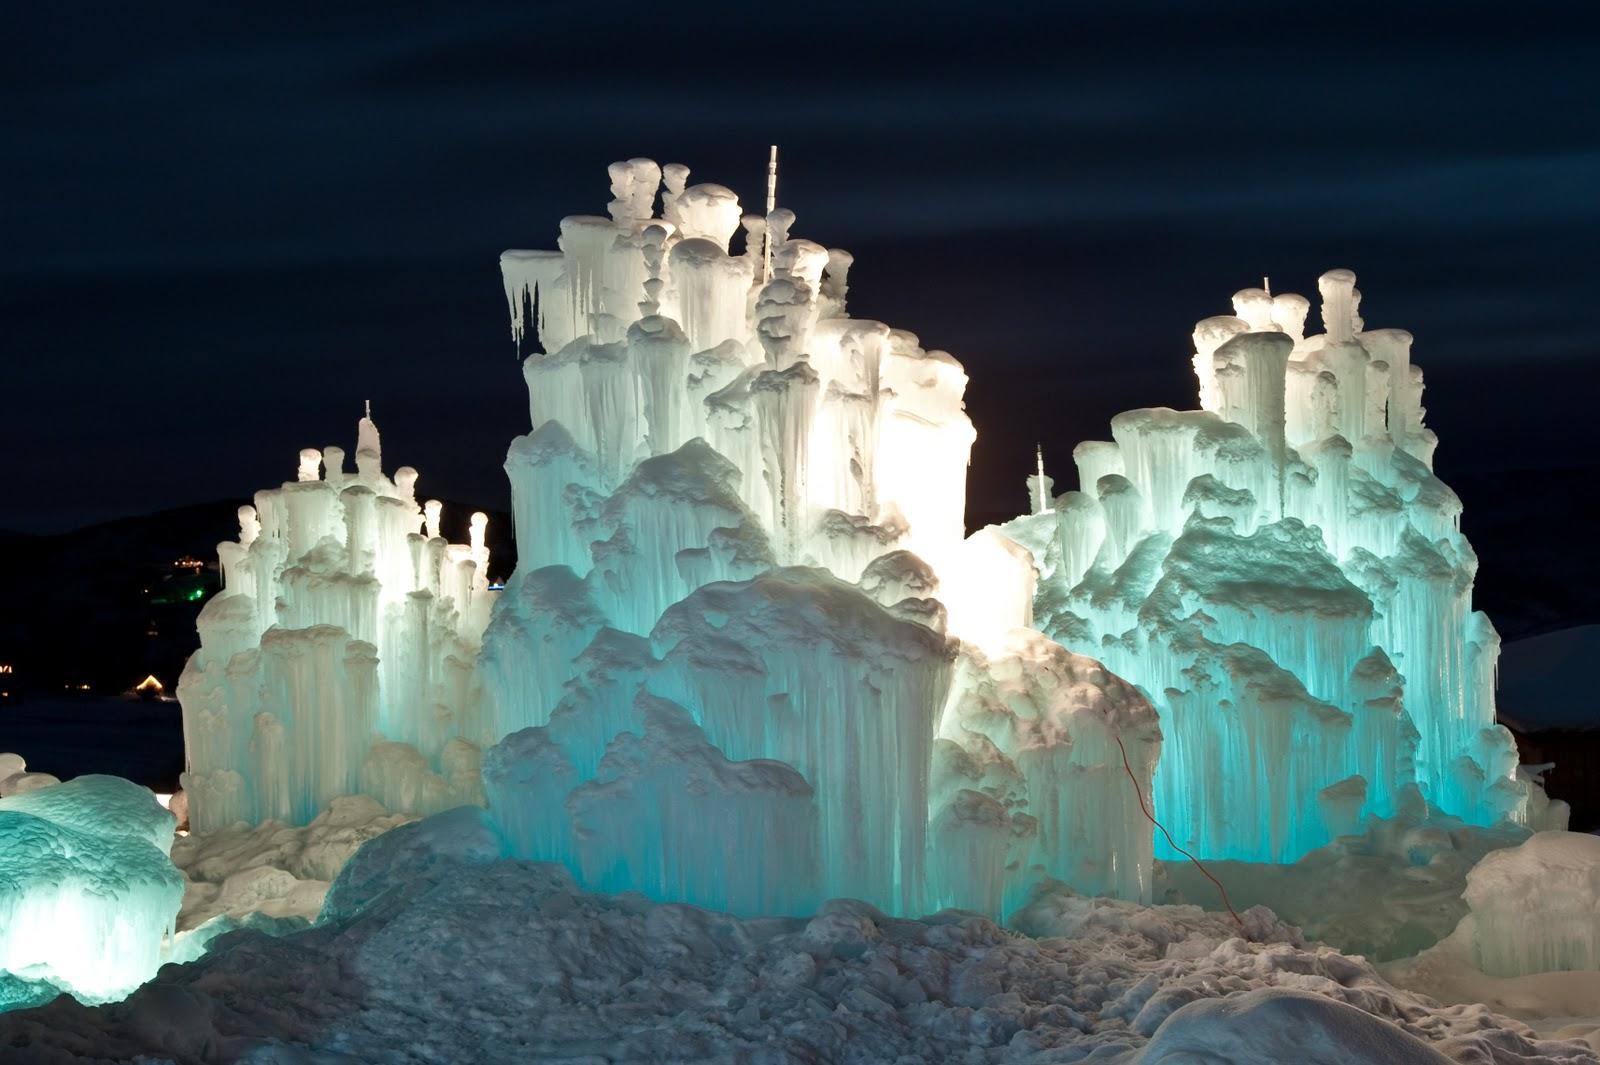 ice castle by kimesama - photo #39